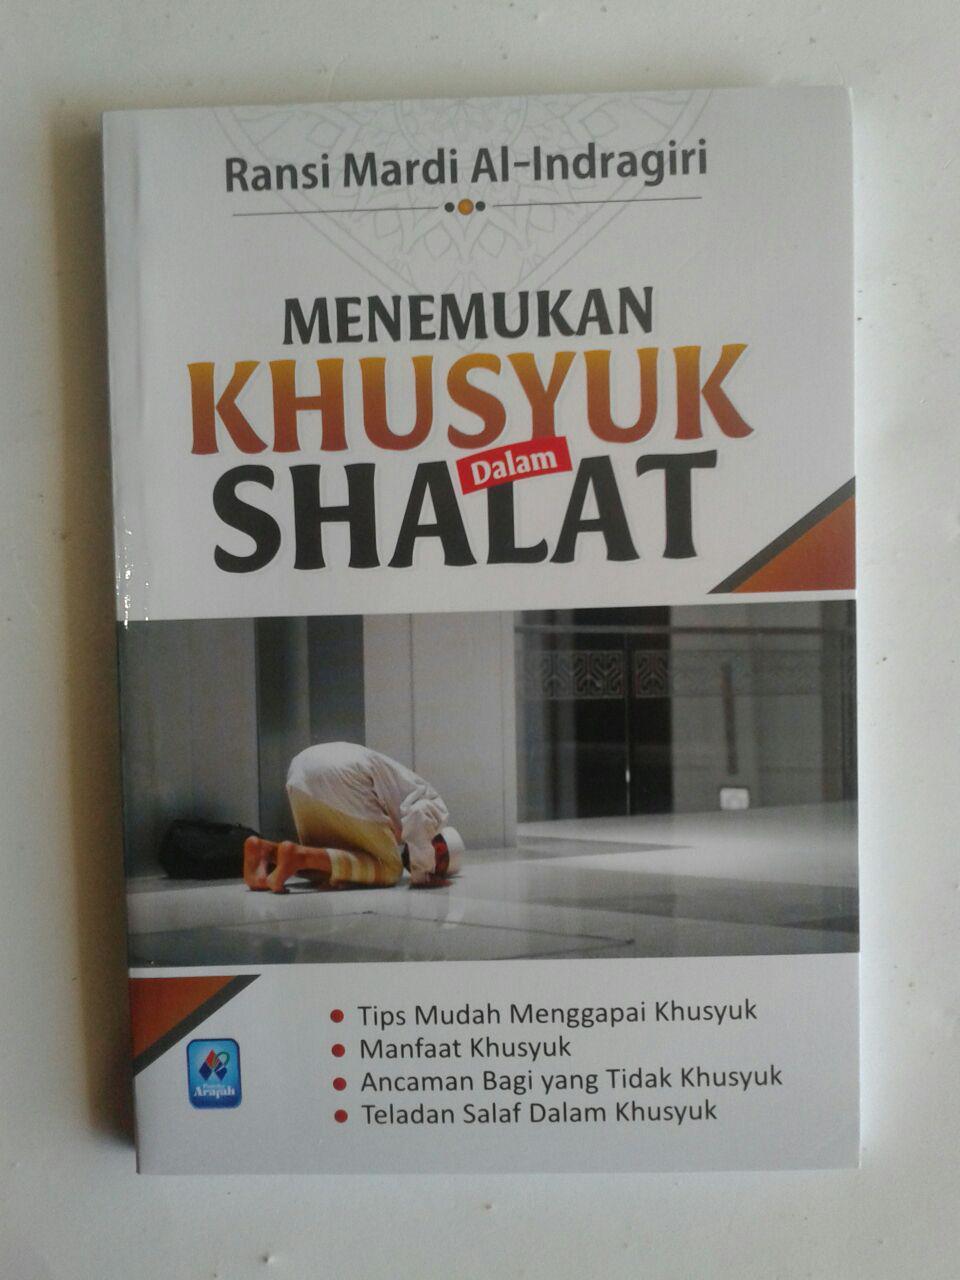 Buku Saku Menemukan Khusyuk Dalam Shalat cover 2